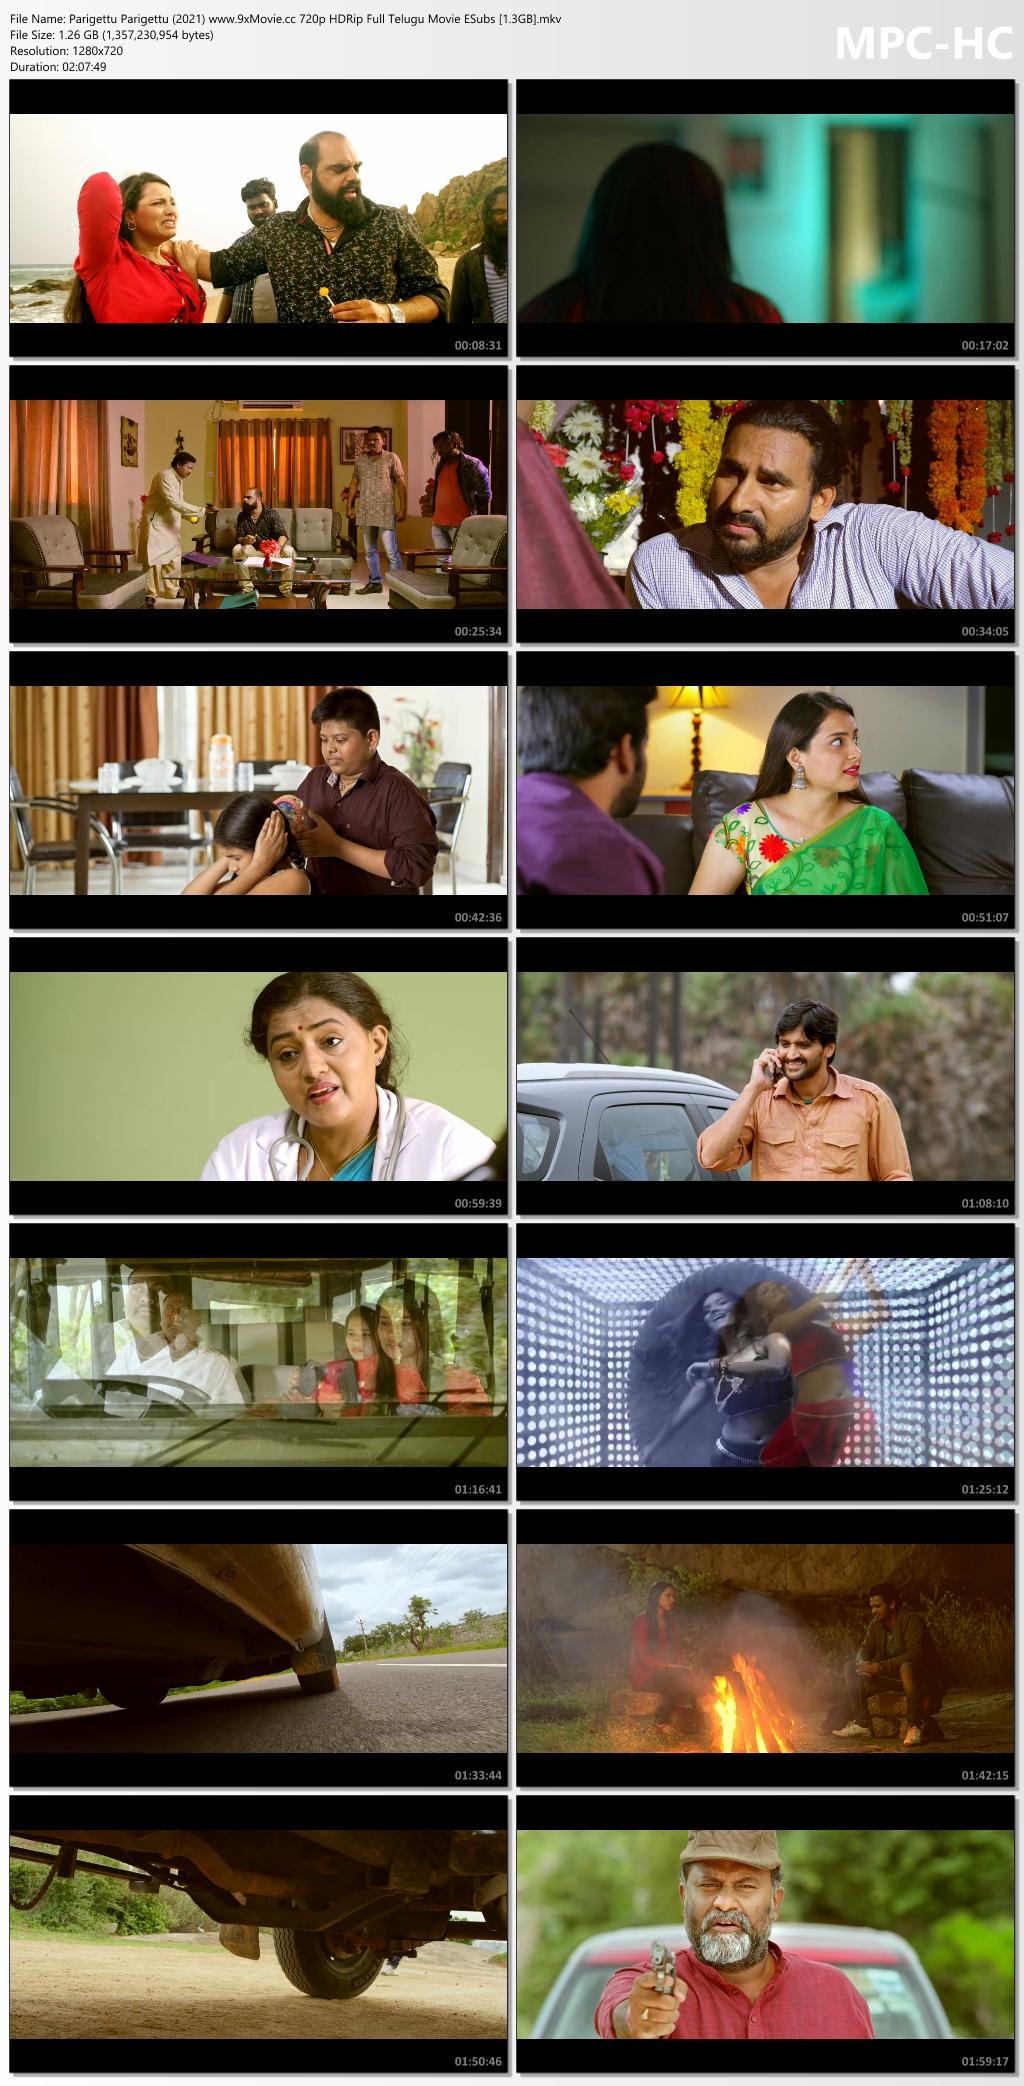 Parigettu-Parigettu-2021-www-9x-Movie-cc-720p-HDRip-Full-Telugu-Movie-ESubs-1-3-GB-mkv